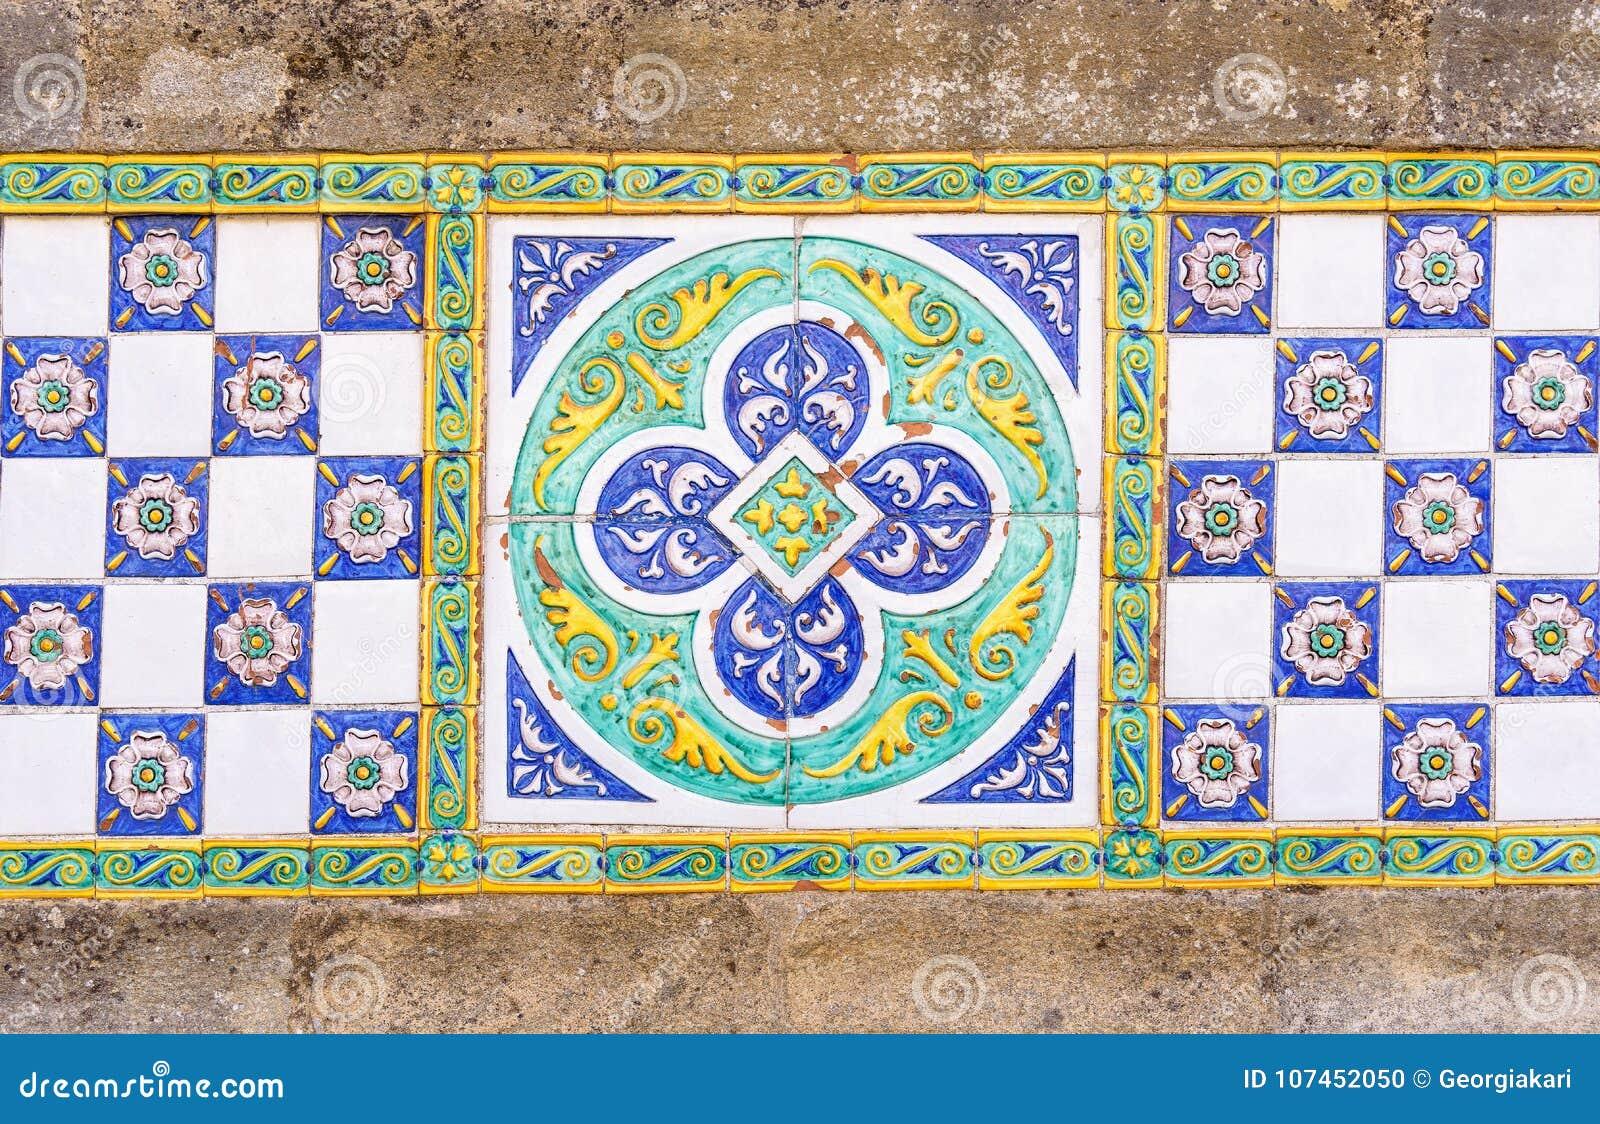 Produzione Ceramica In Italia.Piastrelle Di Ceramica Colorate In Caltagirone Sicilia